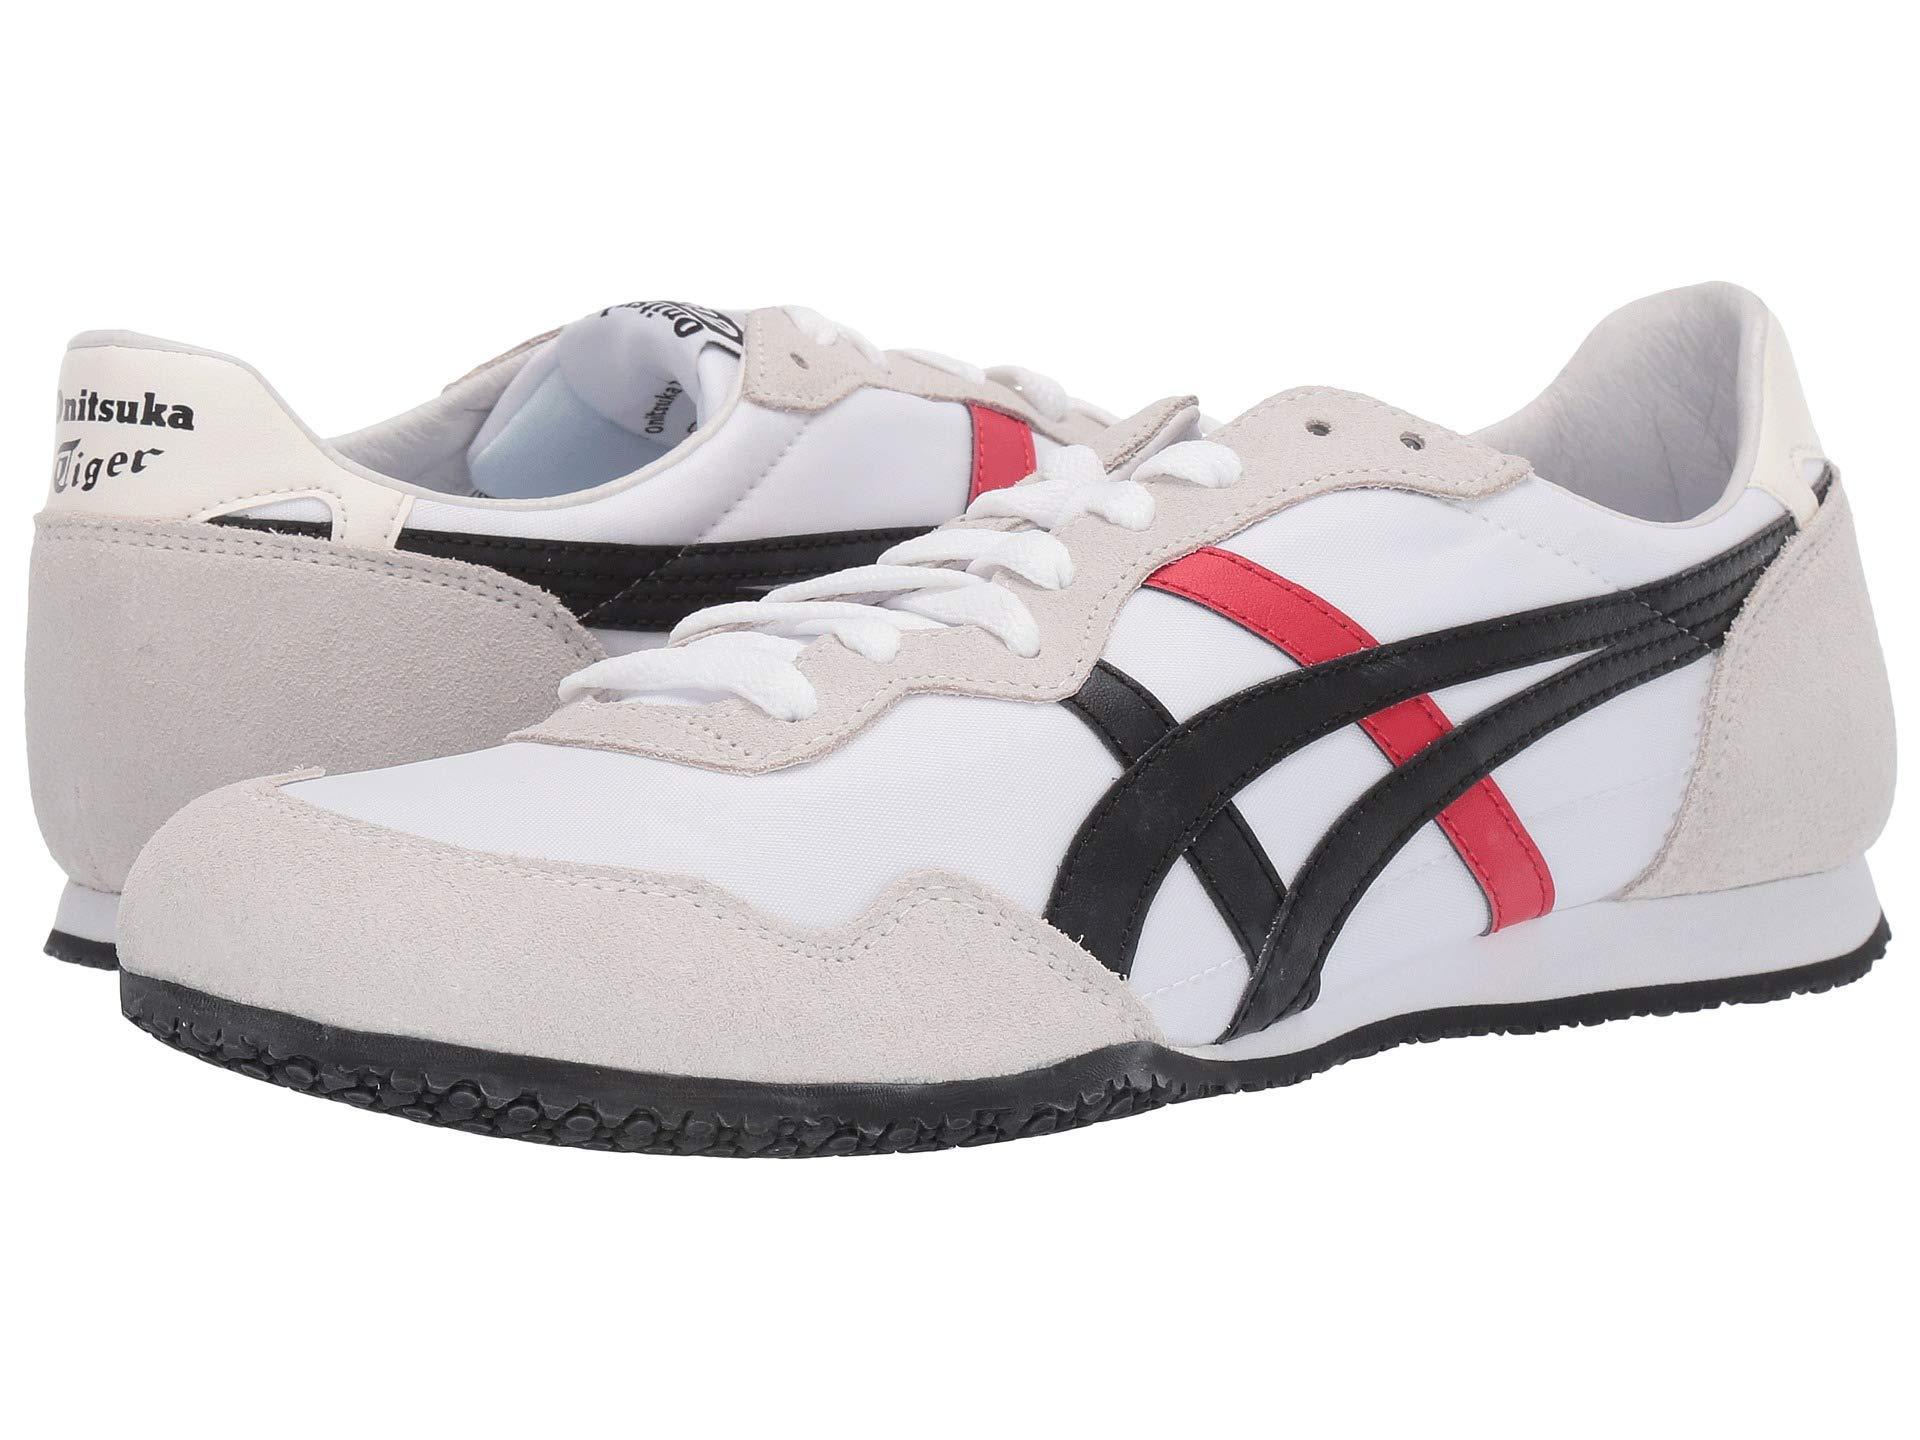 784bbe4c6eb3 Lyst - Asics Serranotm (white black 3) Classic Shoes in White for Men